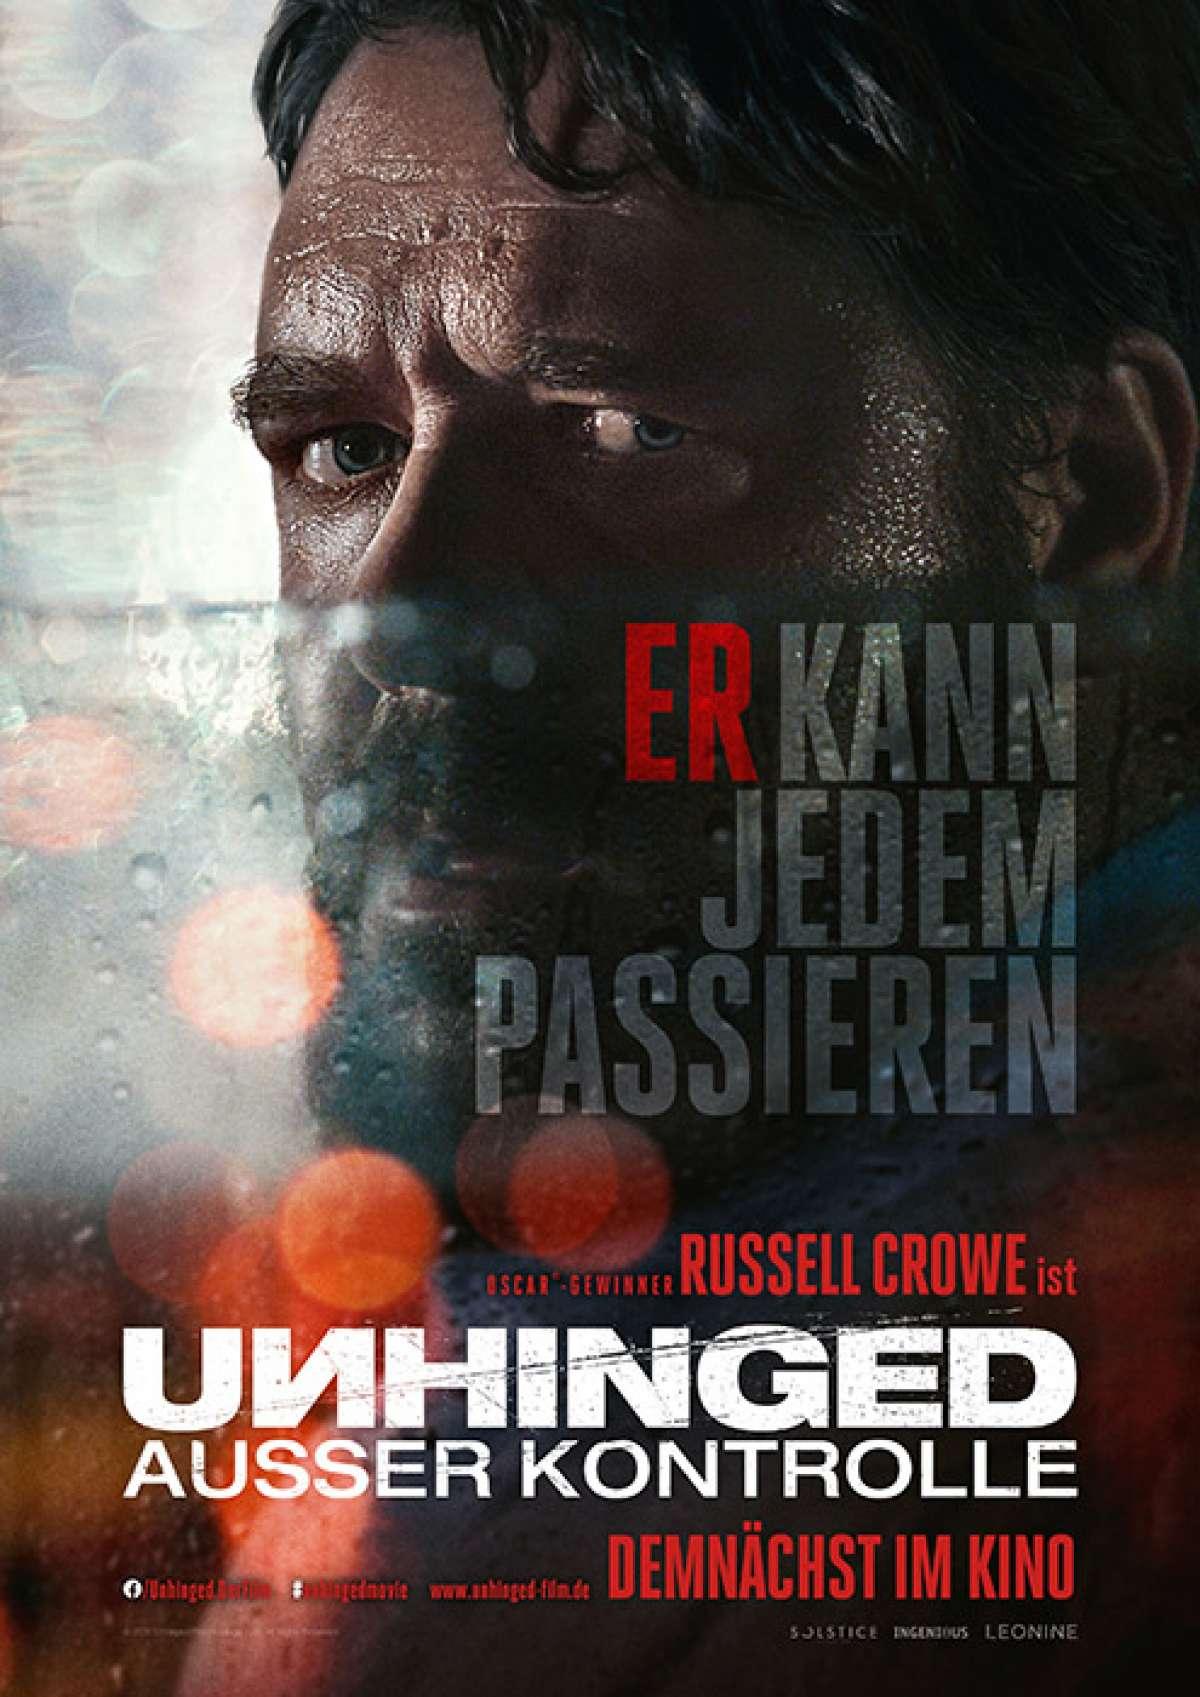 Unhinged - Ausser Kontrolle - CineK-Kino  - Korbach